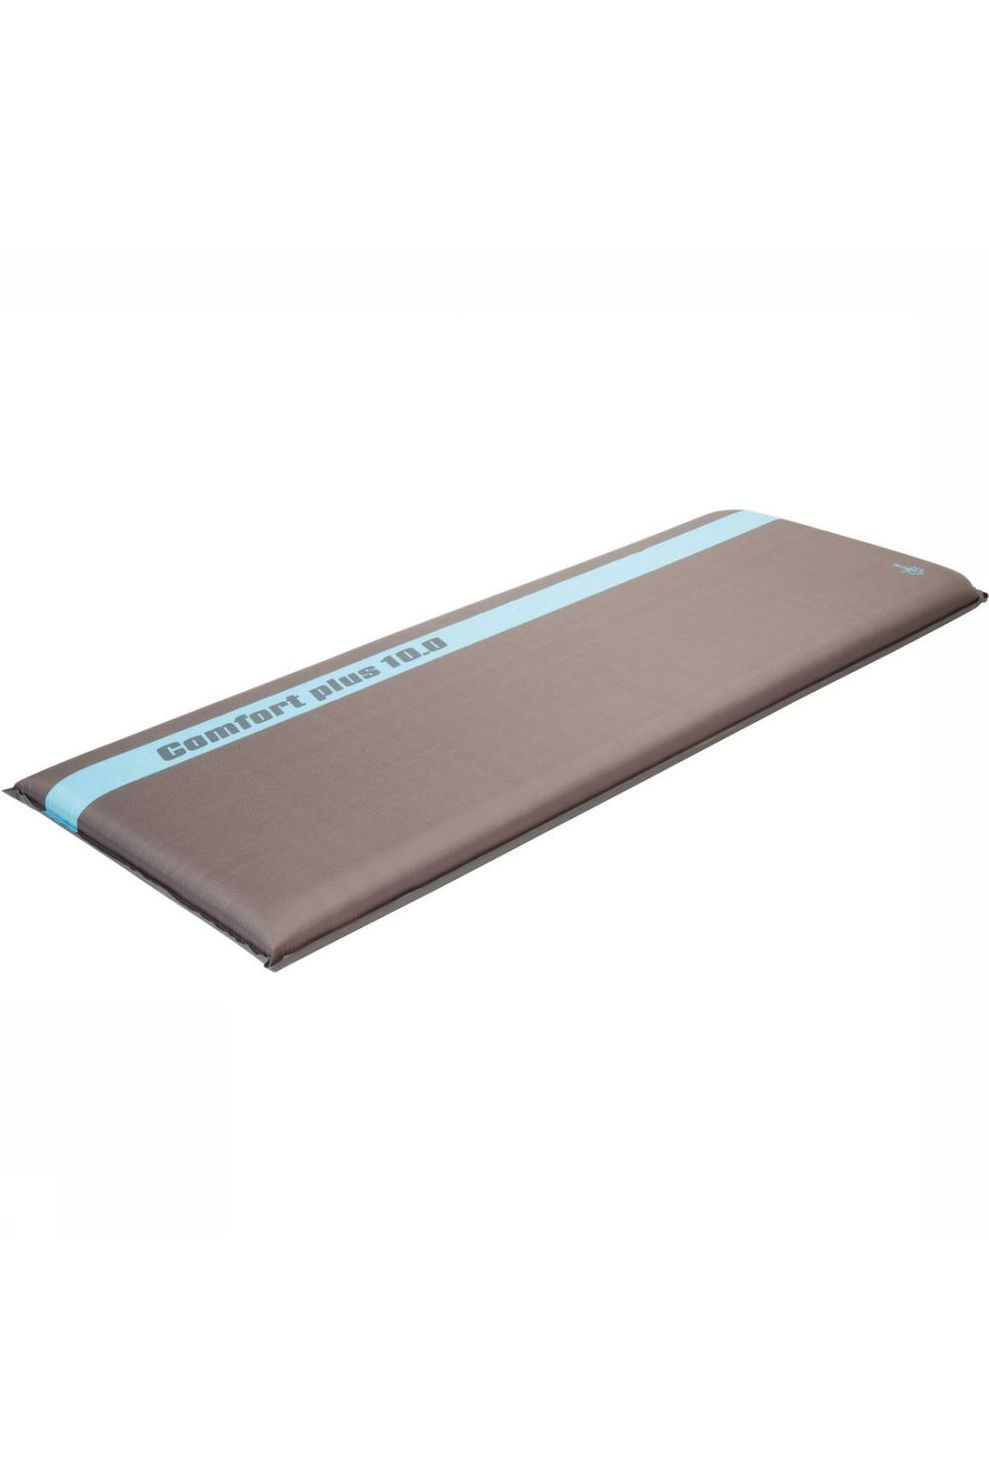 Bo-Camp Slaapmat Si Comfort Plus 10.0 198X63X10 Cm - Grijs/Blauw